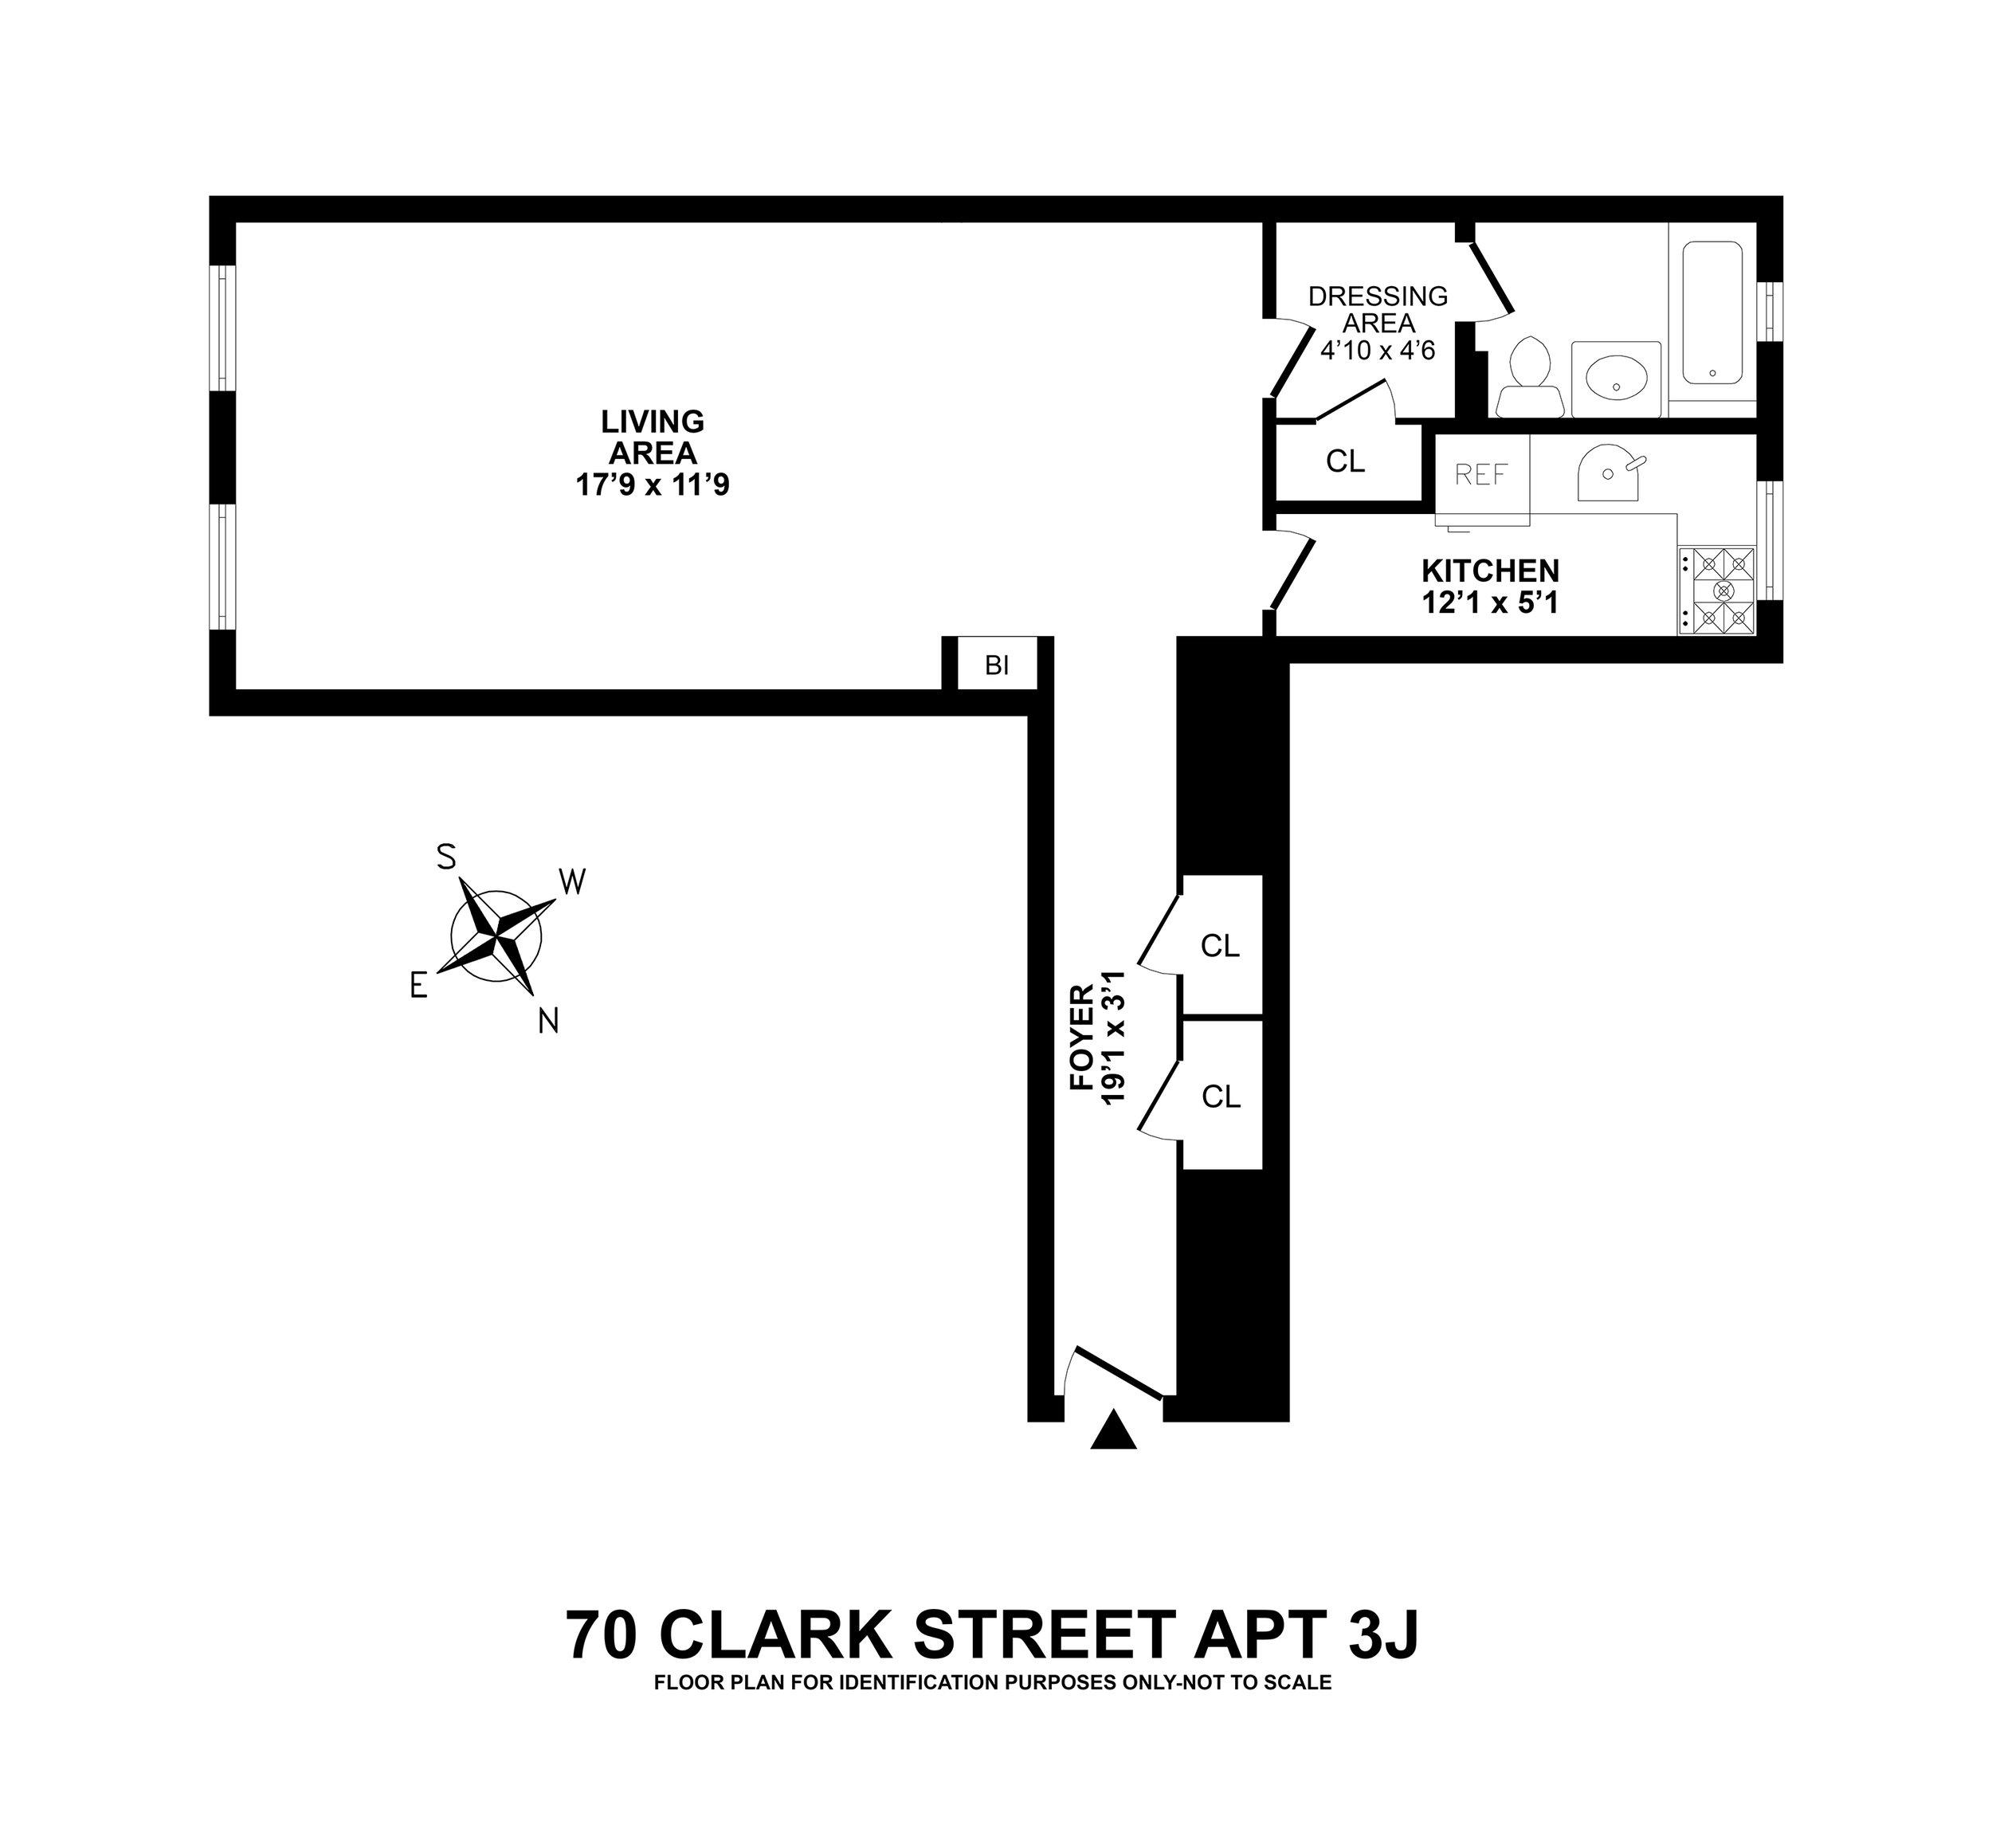 70ClarkSt3J-GPFP.jpg